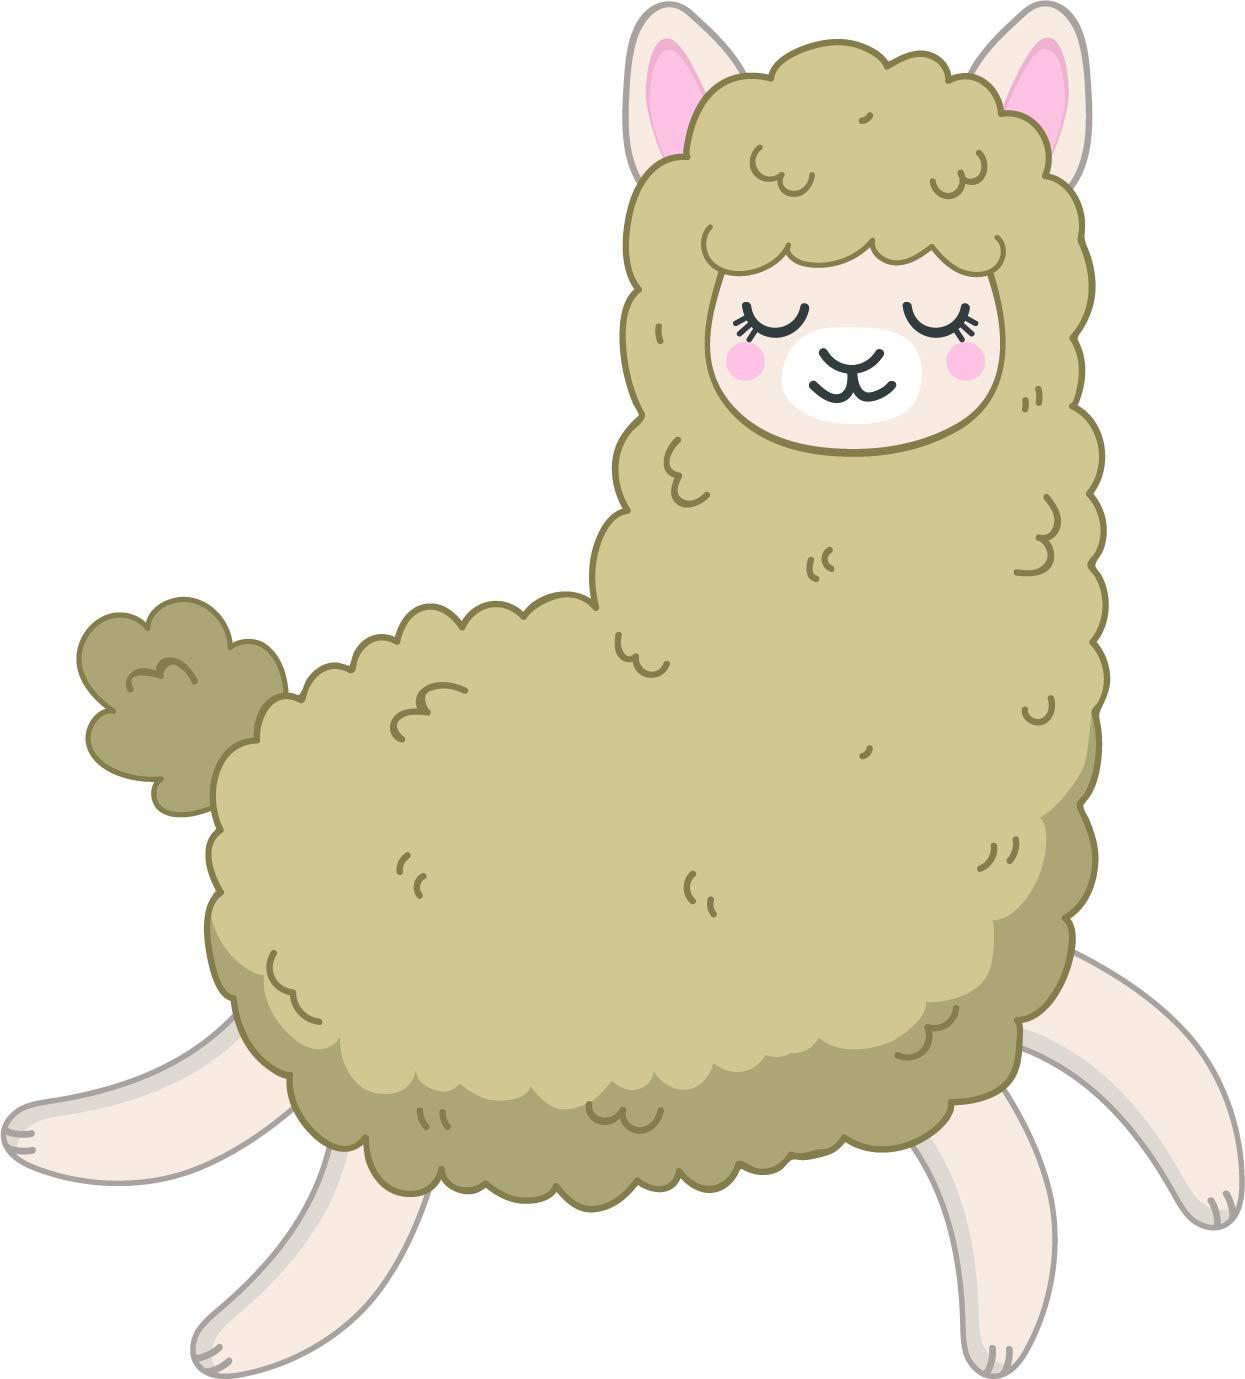 Amazon.com: Cute Happy Kawaii Neutral Llama Alpaca Cartoon.